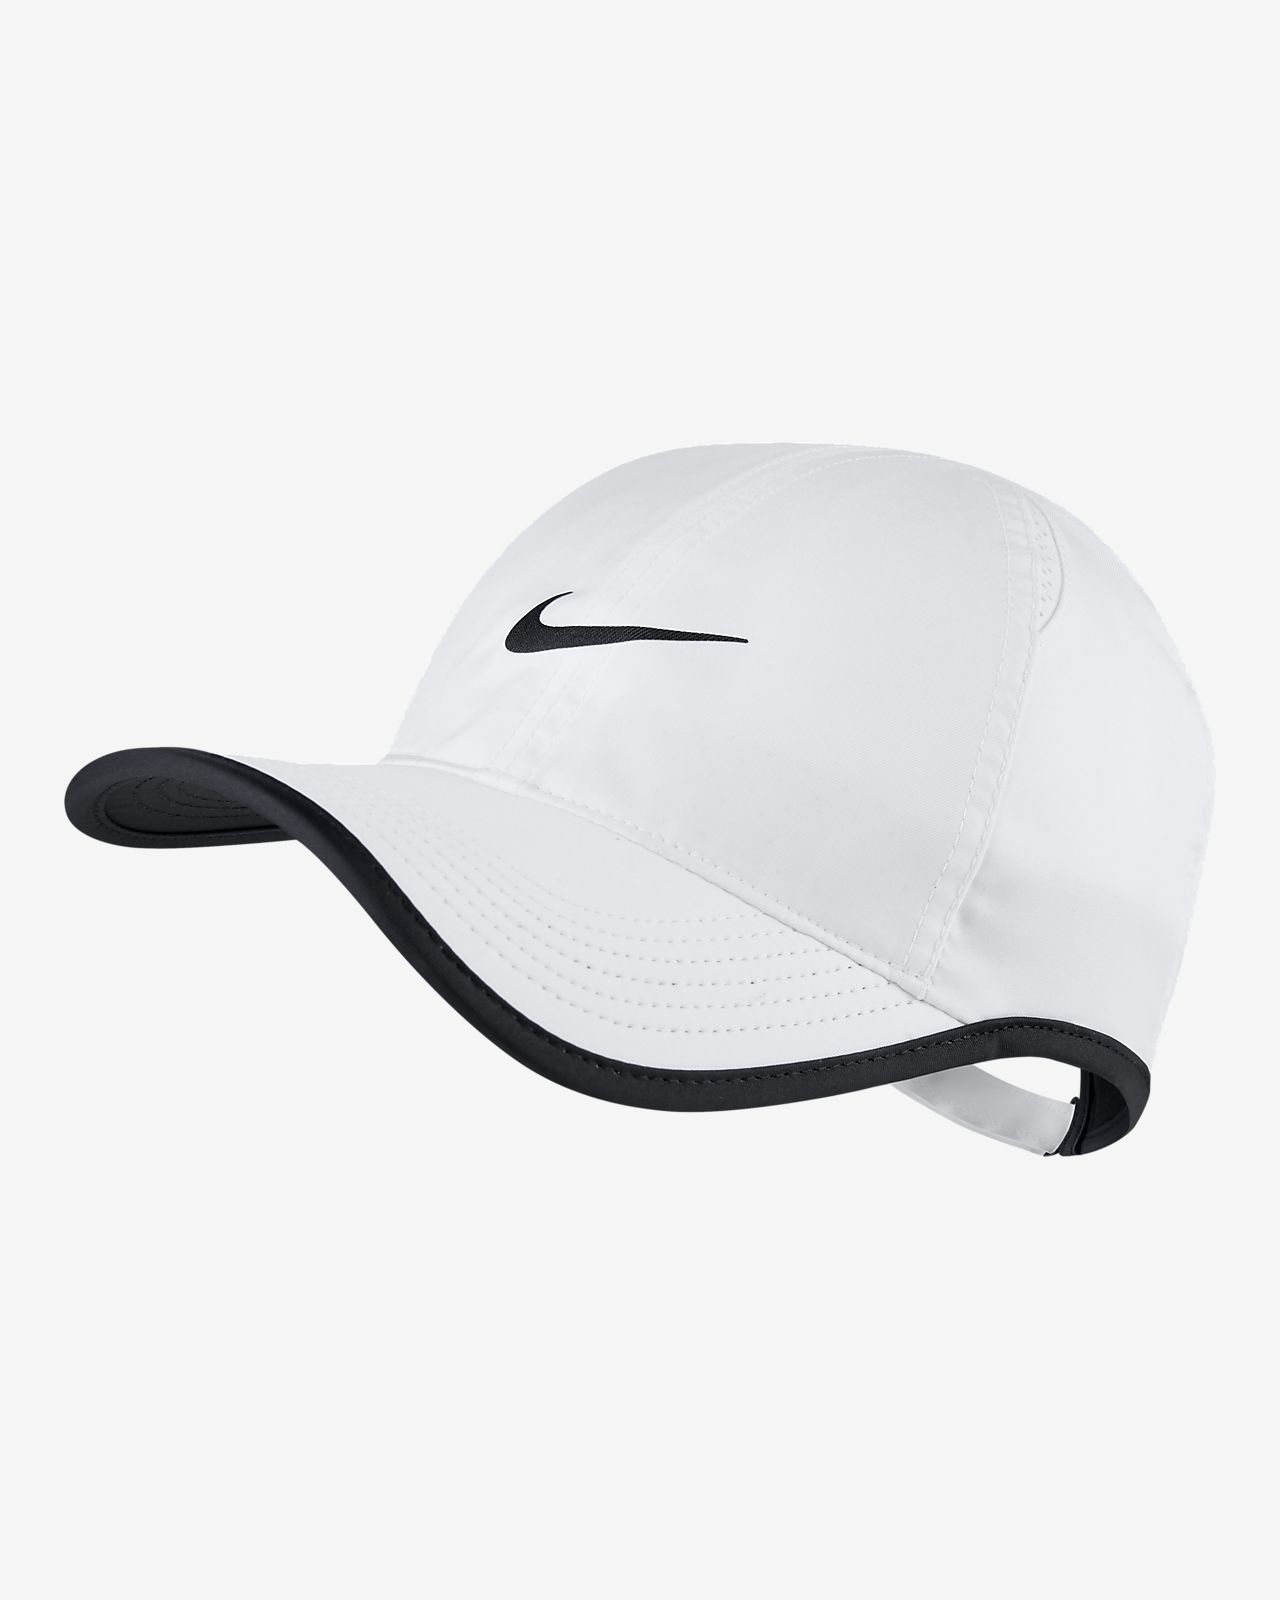 NikeCourt AeroBill Featherlight Gorra de tennis